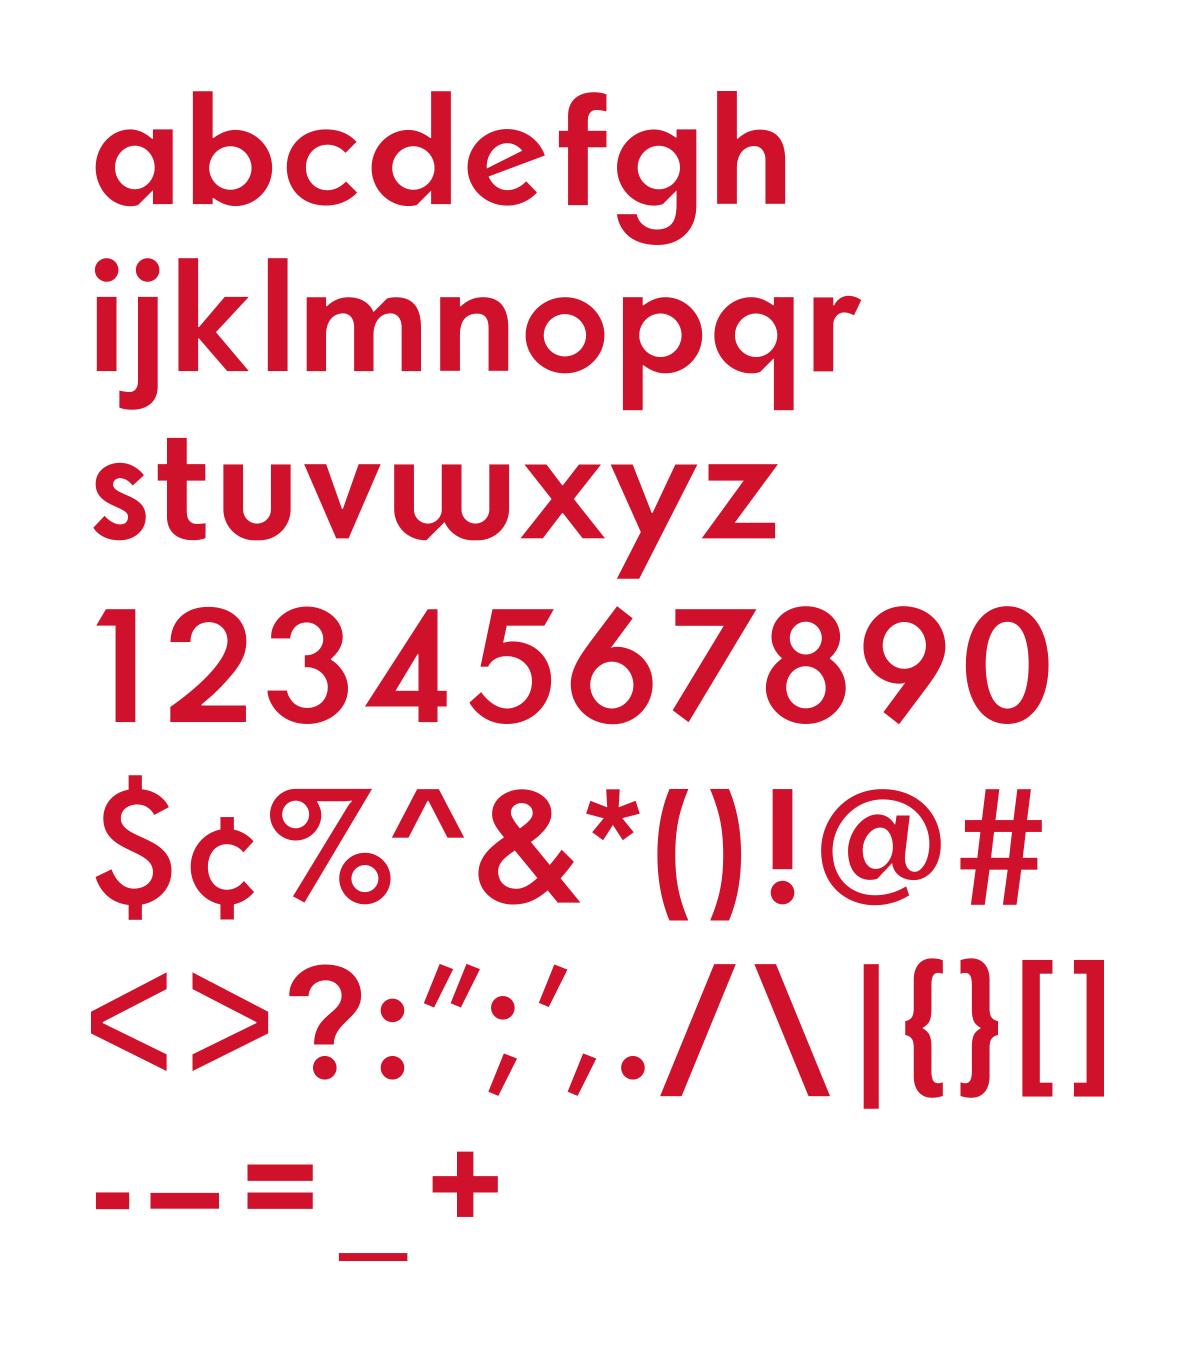 Typeface allcharacters lrg